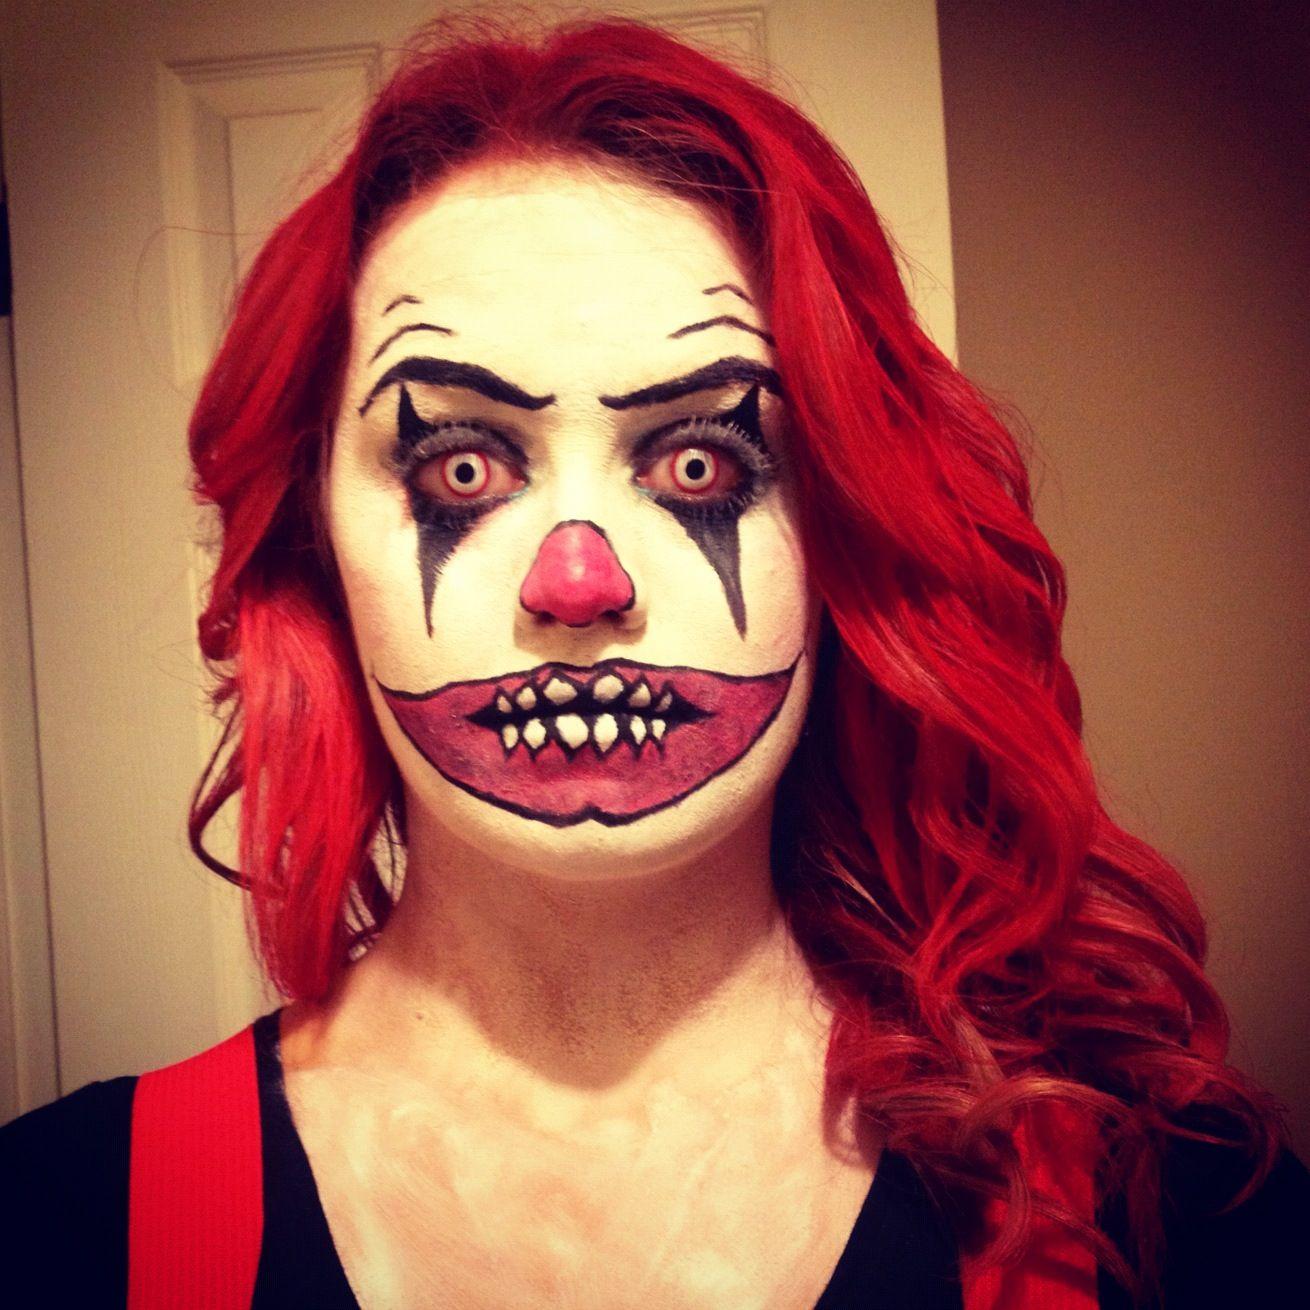 creepy clown halloween costume my style pinterest. Black Bedroom Furniture Sets. Home Design Ideas